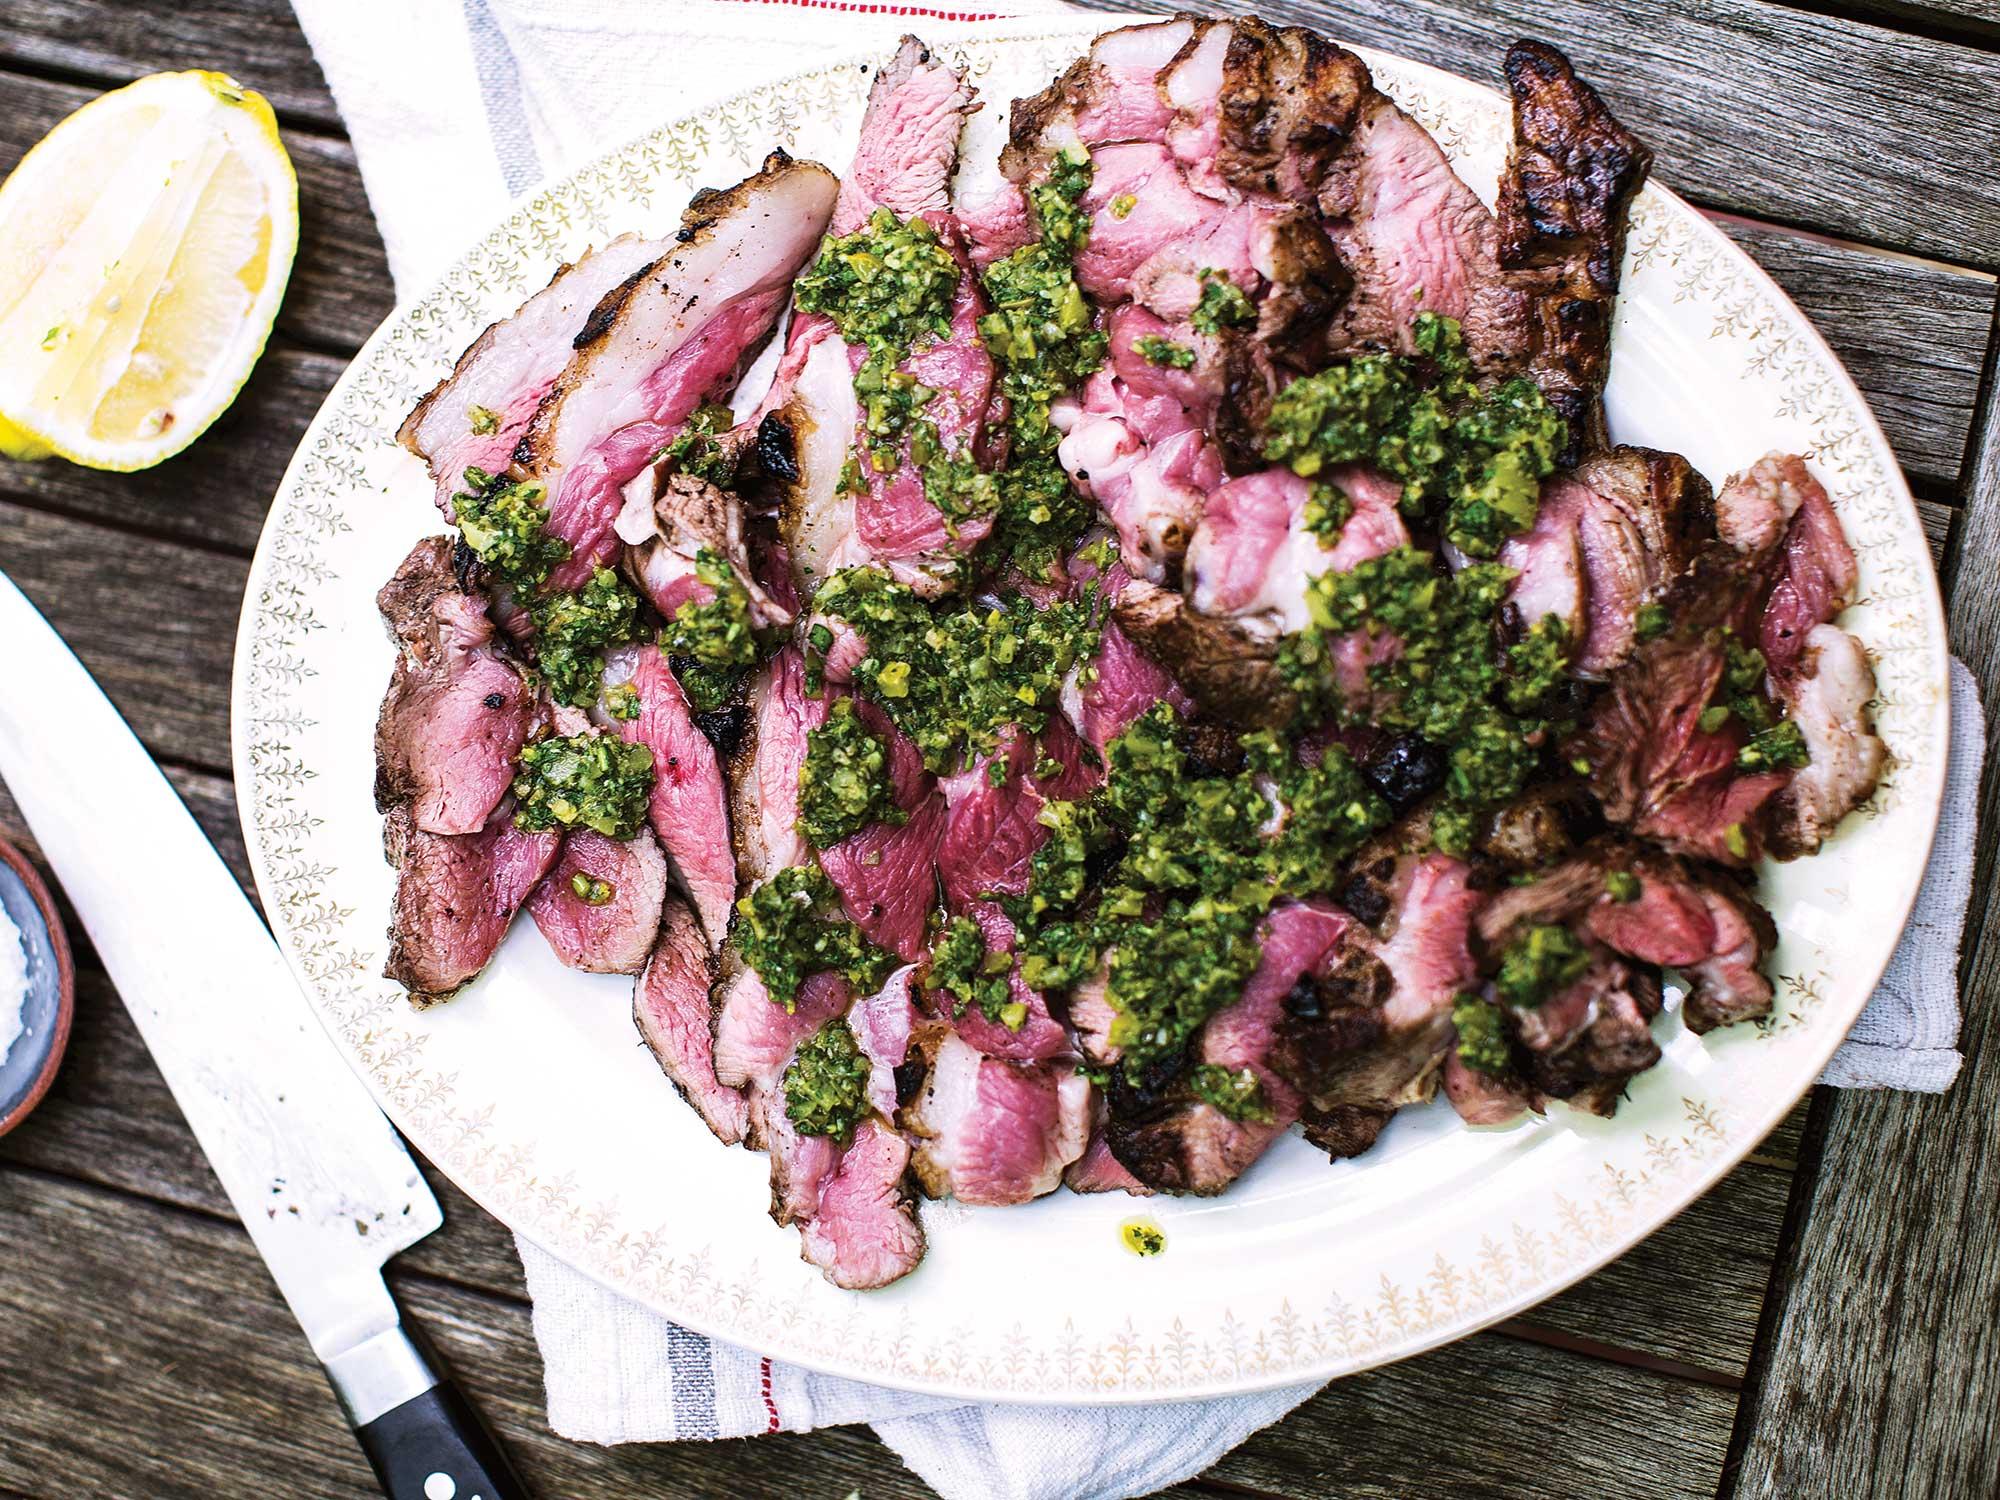 Grilled lamb sirloin recipe